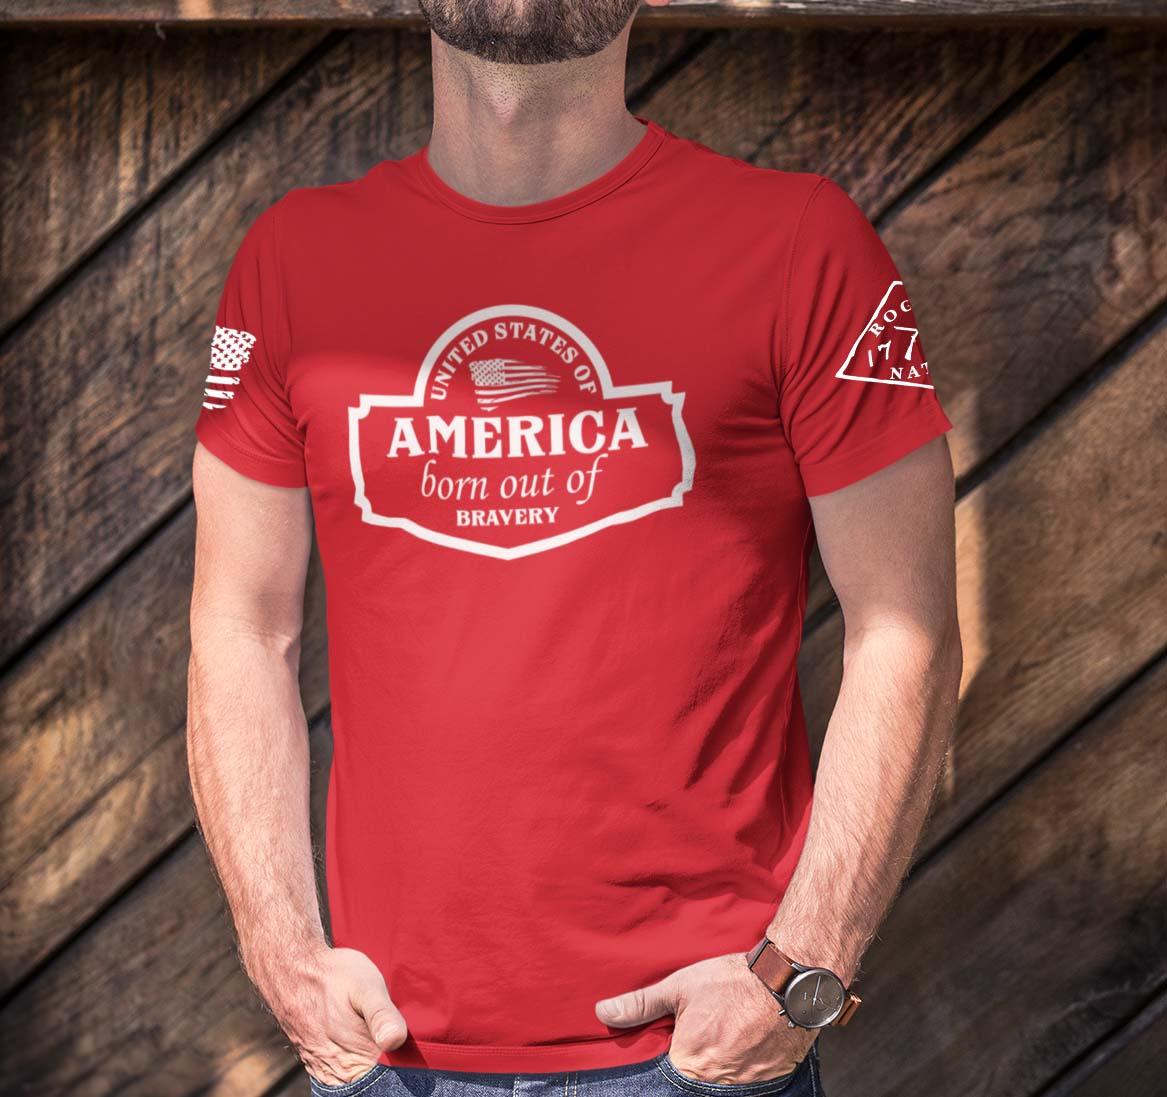 September Club Shirt on Men's Red T-Shirt